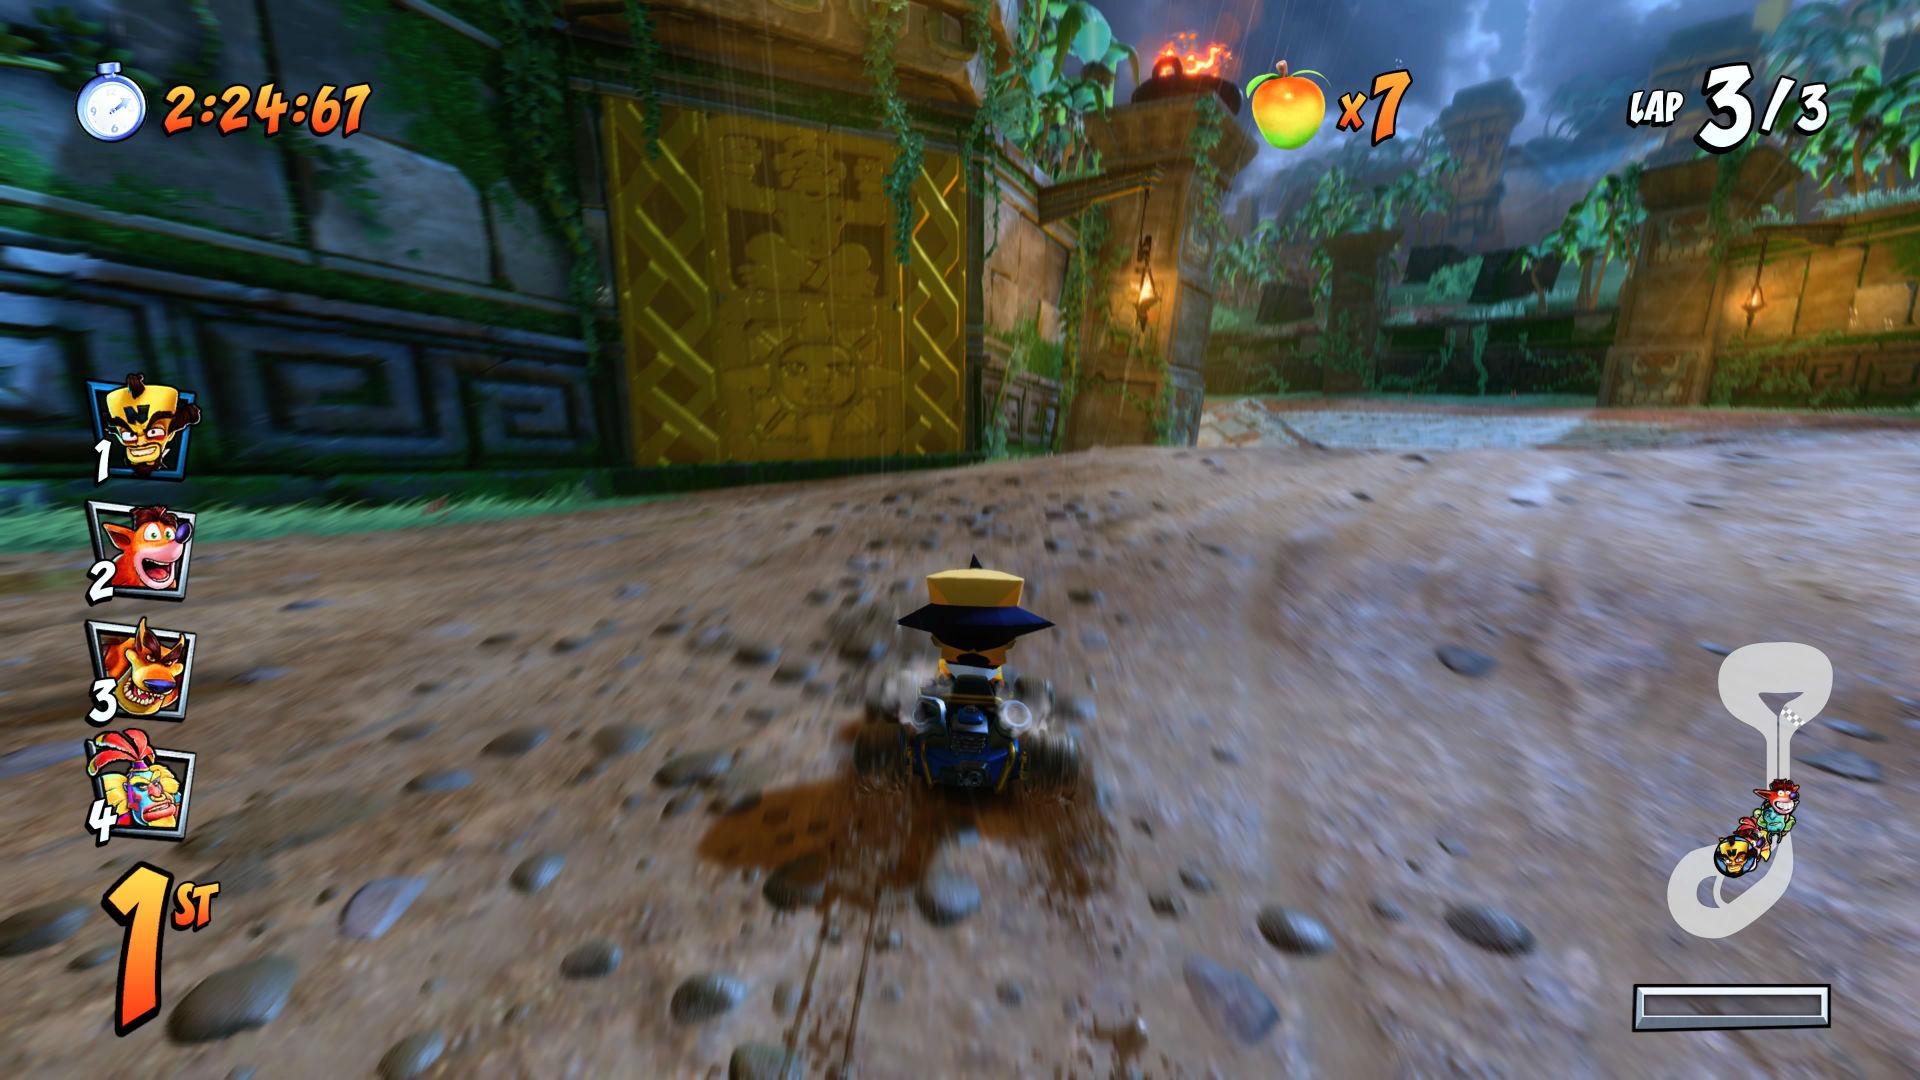 Tiger Temple Crash Team Racing Nitro-Fueled